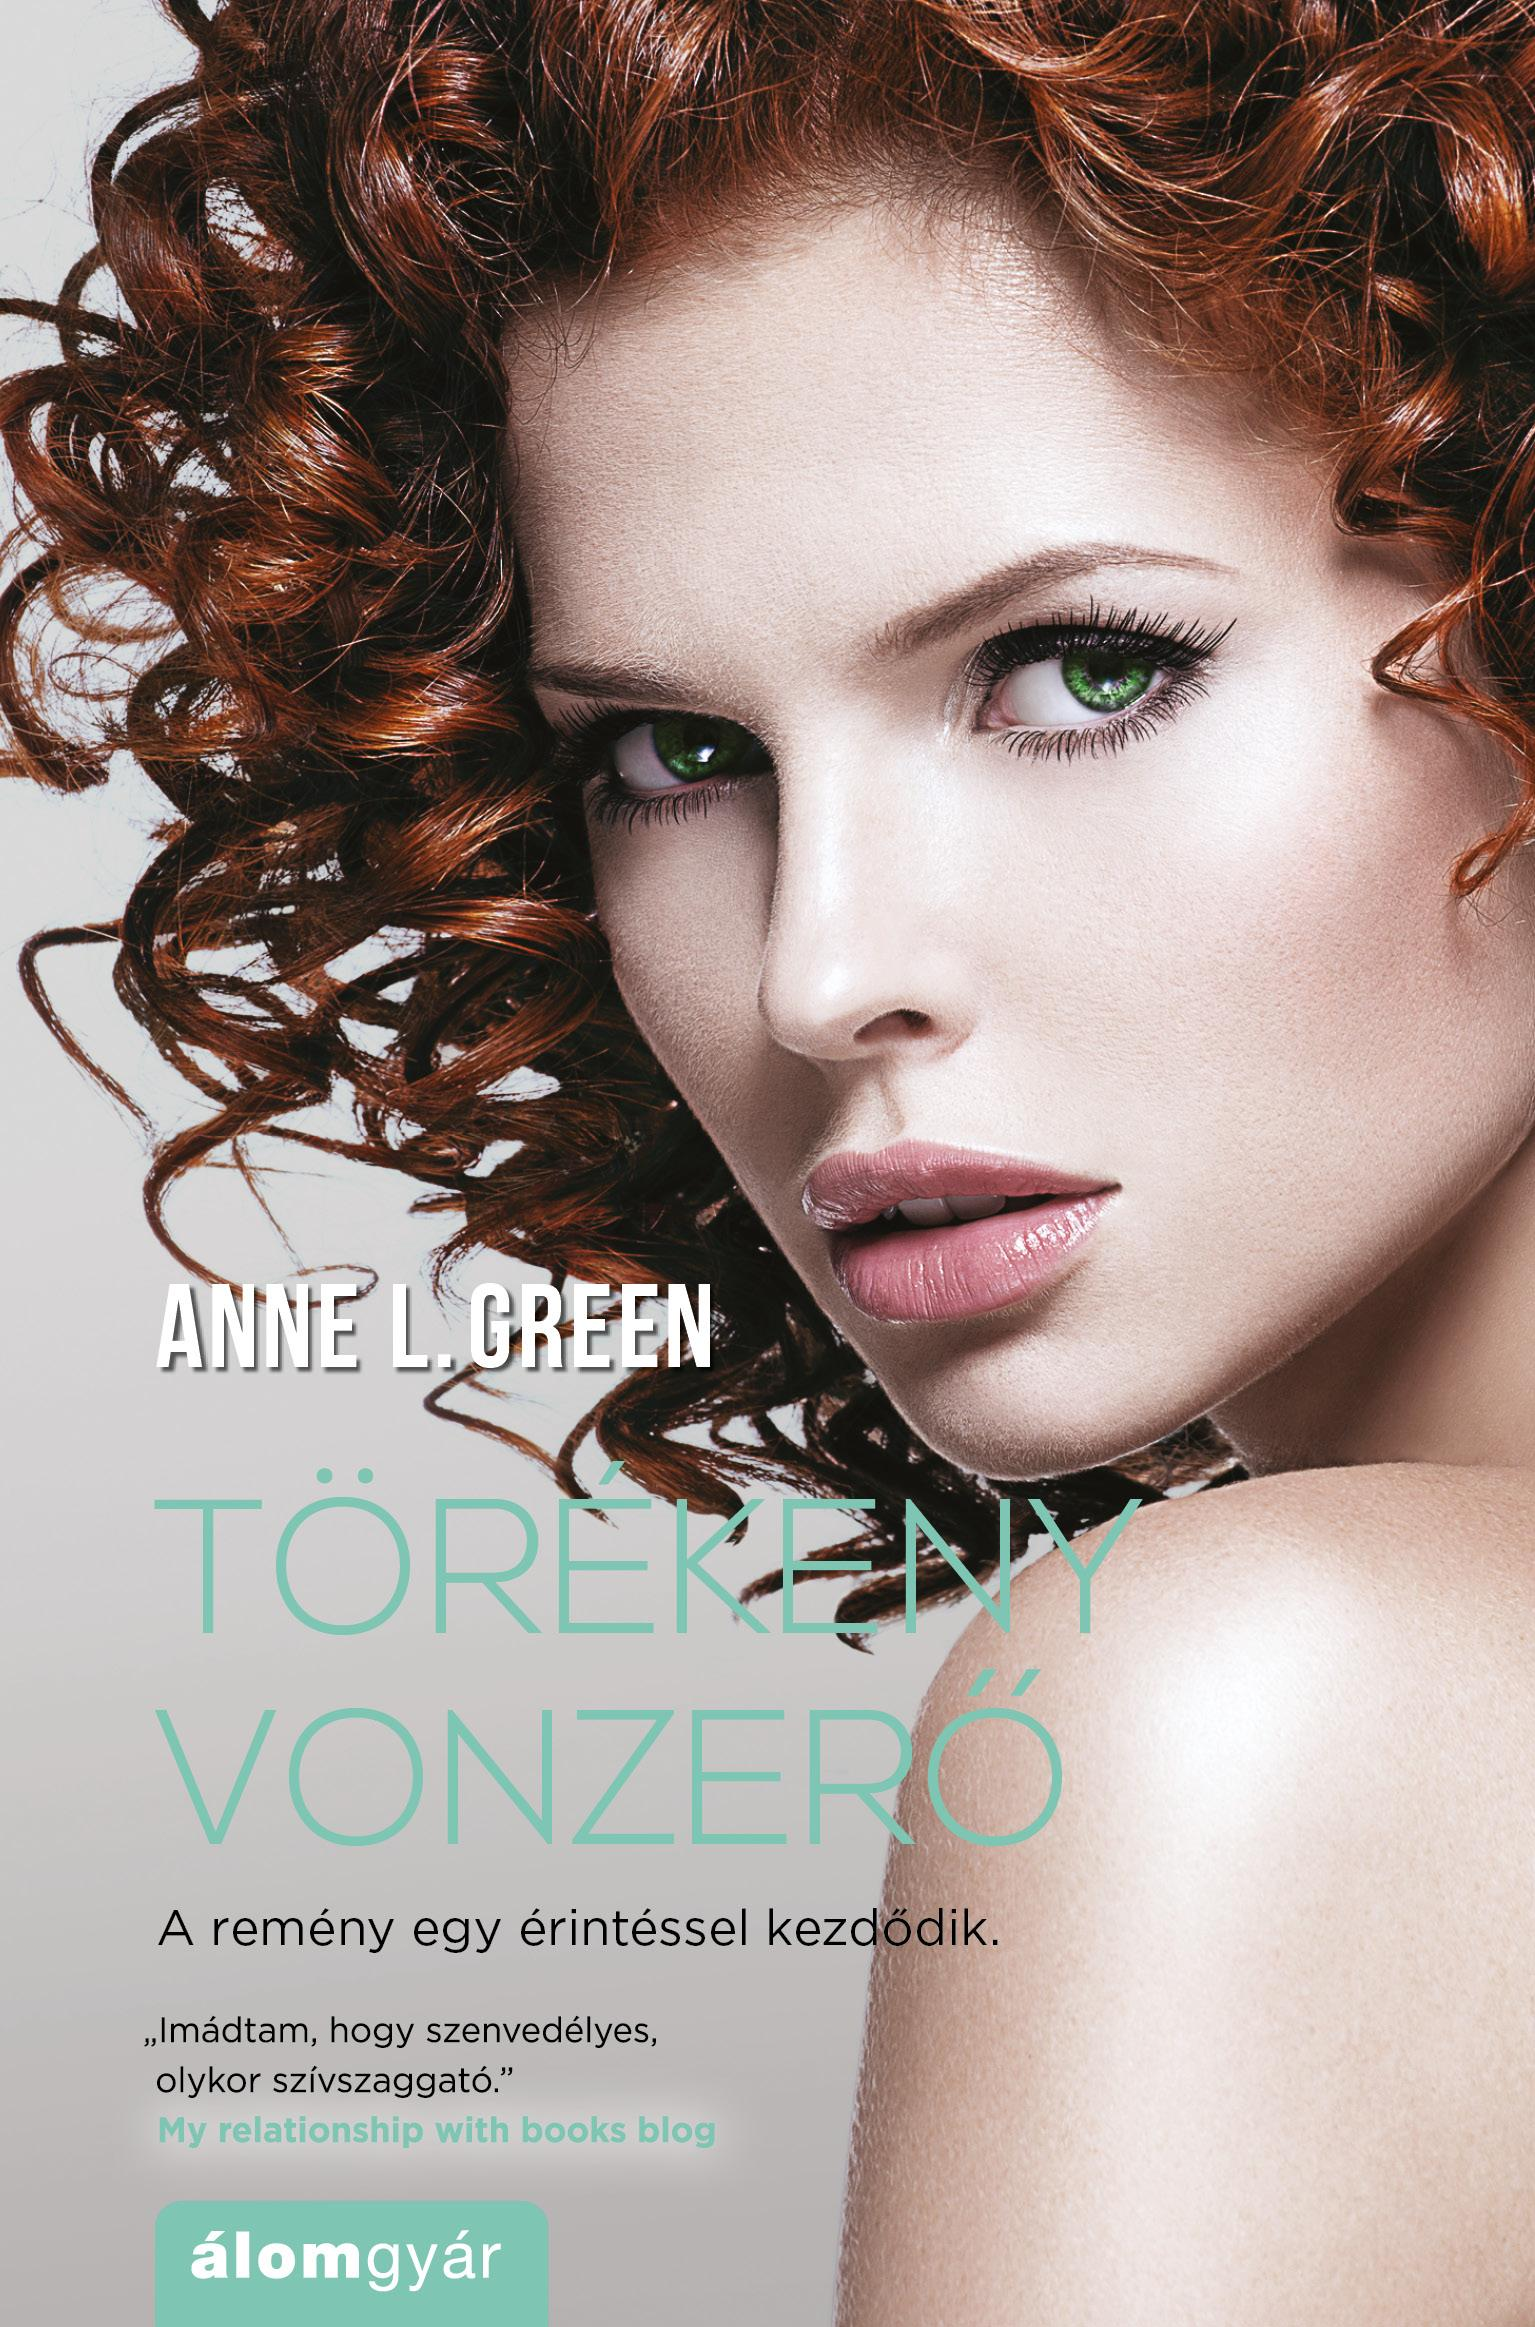 GREEN, ANNE L. - TÖRÉKENY VONZERŐ